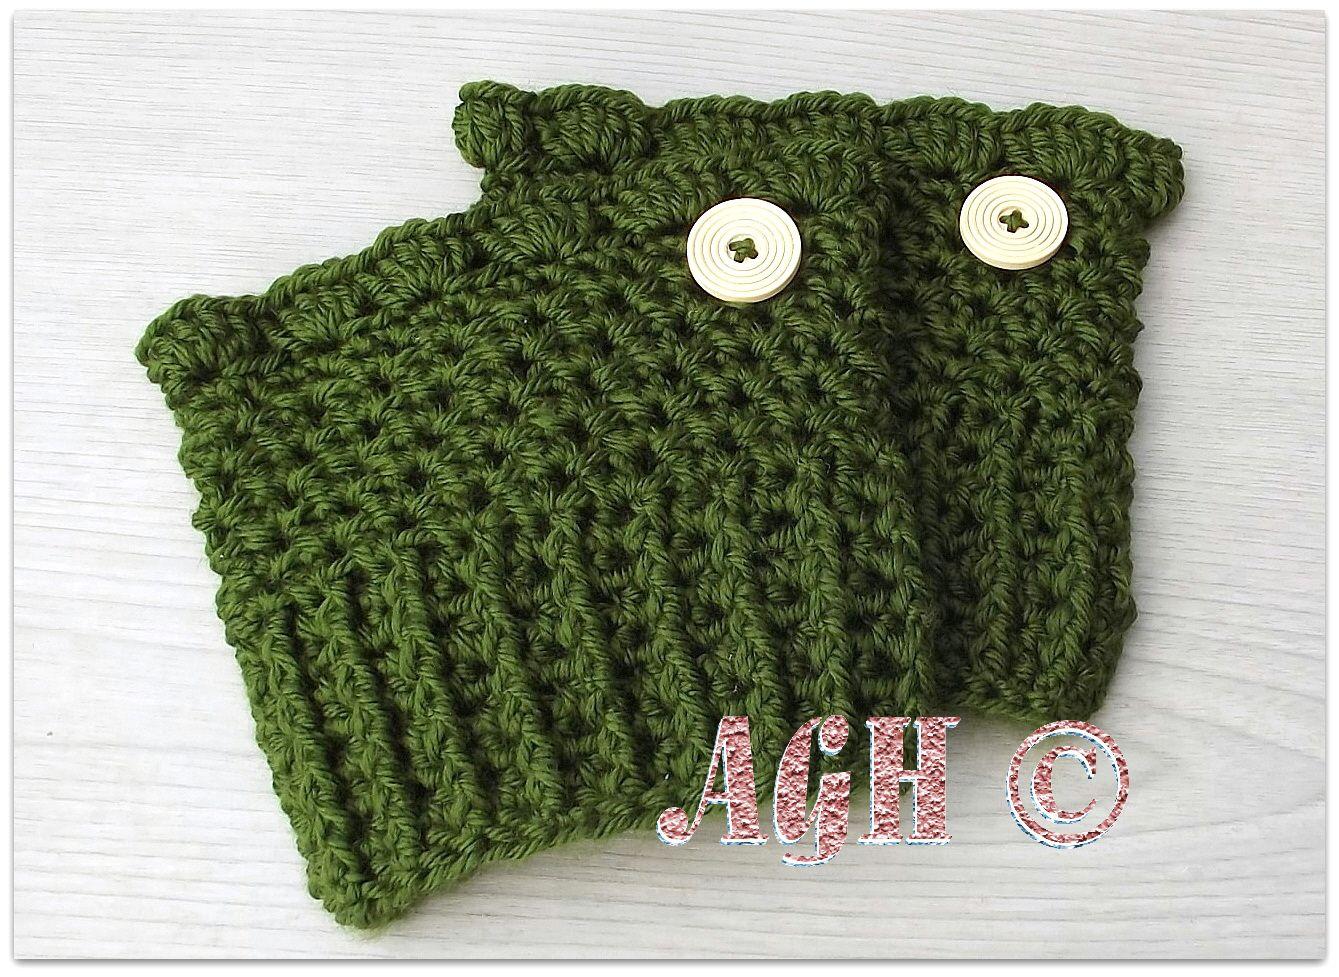 dk grn cuffsbc.jpg | diy crochet | Pinterest | Adornos